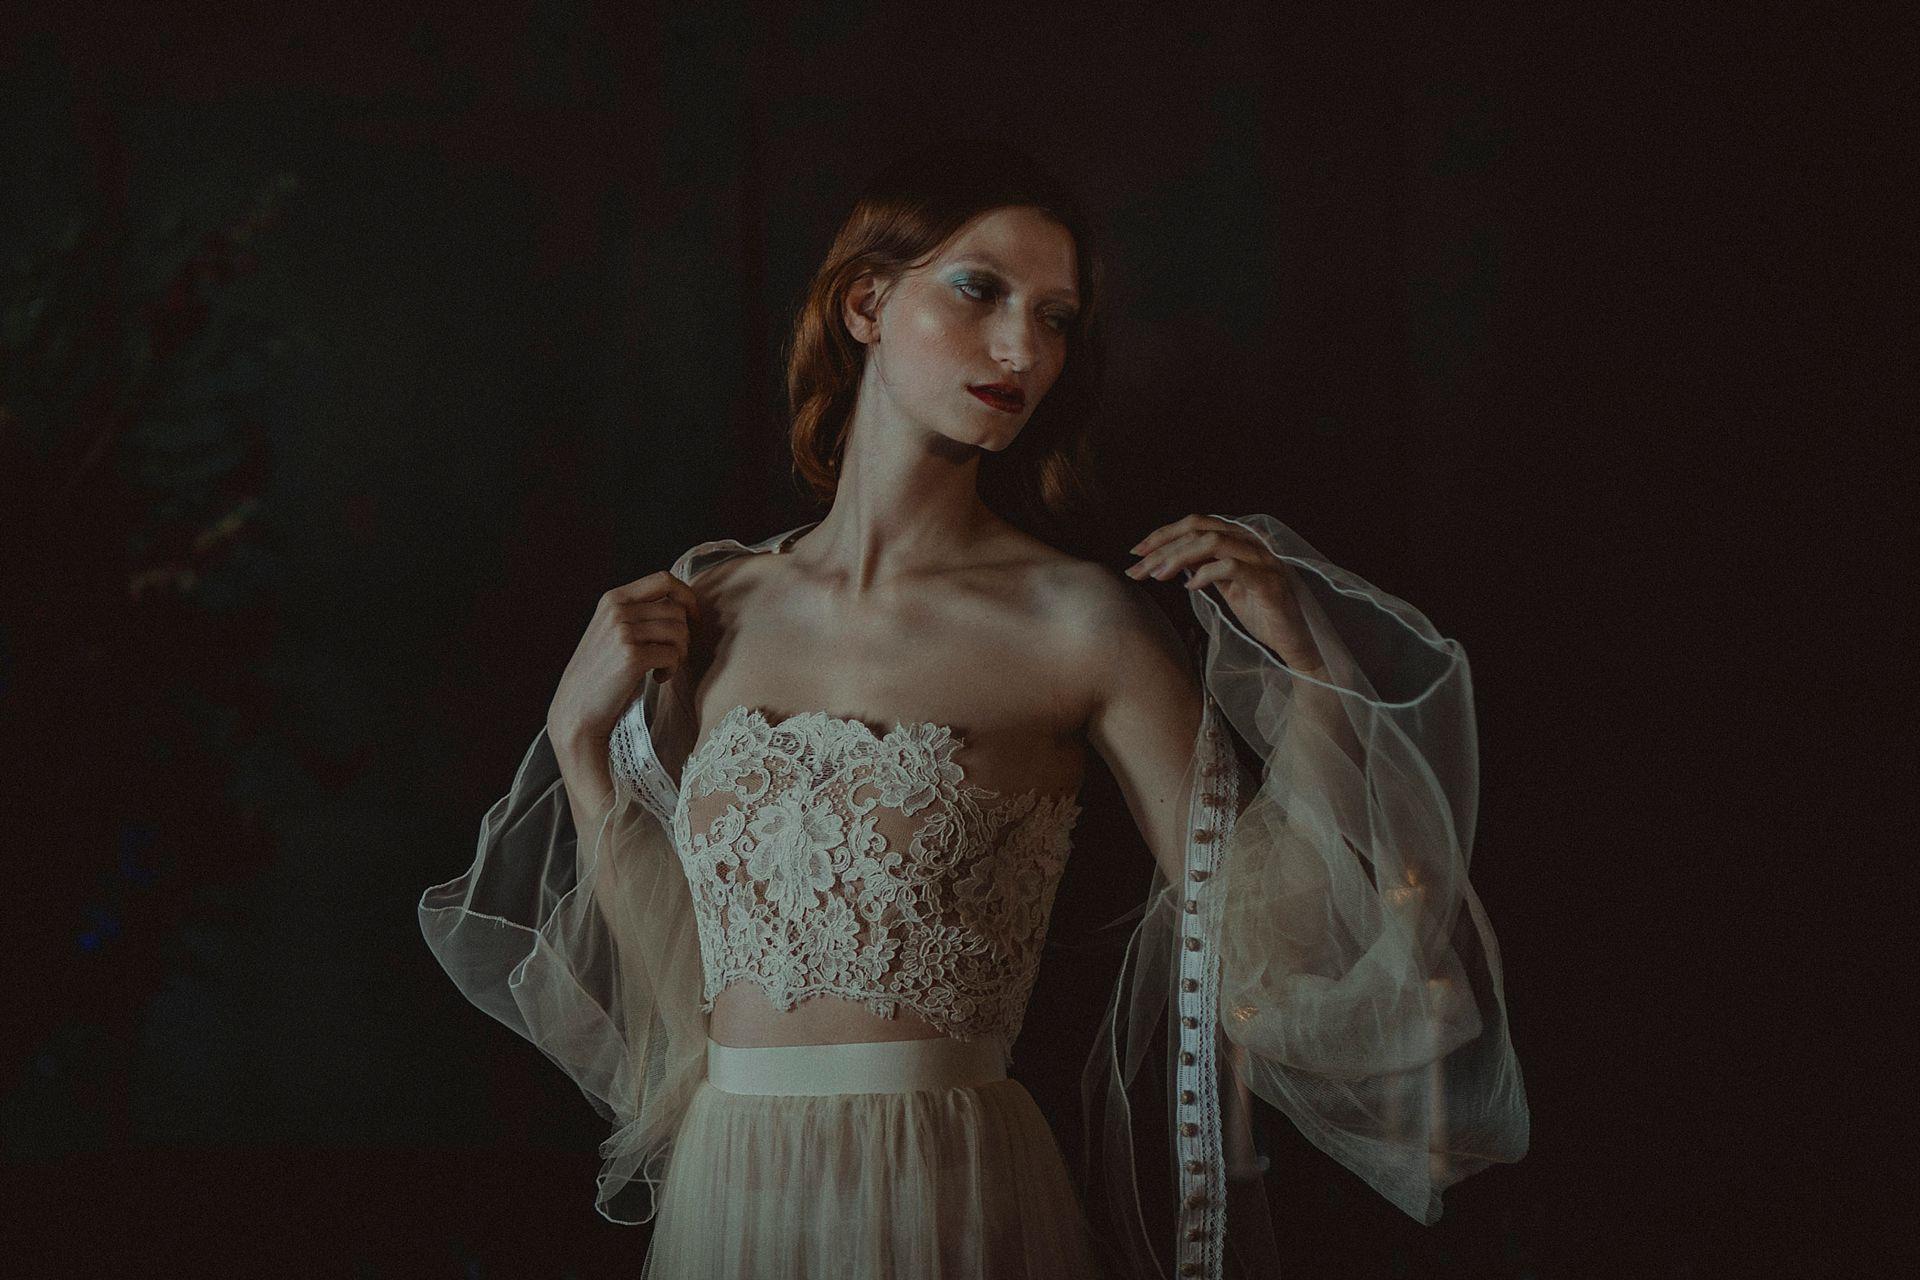 Decadent Wedding Inspiration- Moody Wedding Inspiration- Sudio Fotografico Bacci- Unconventional Wedding- bride getting ready